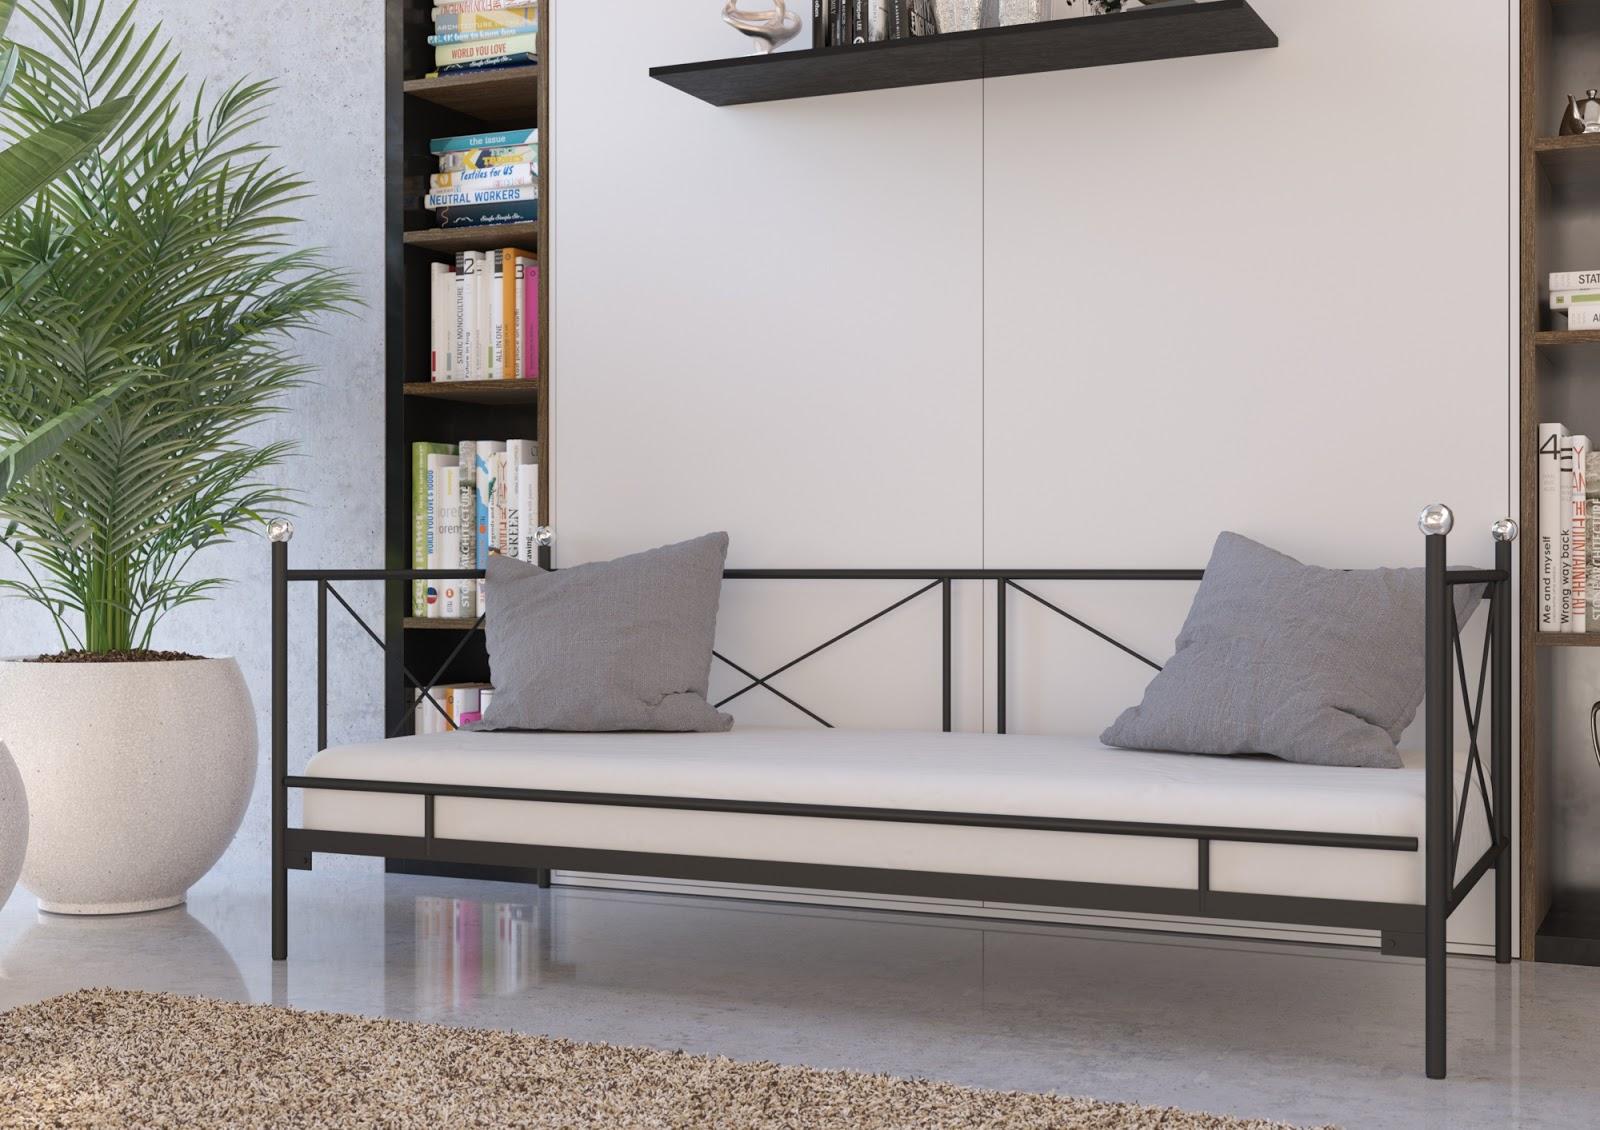 Łóżko metalowe sofa wzór 22